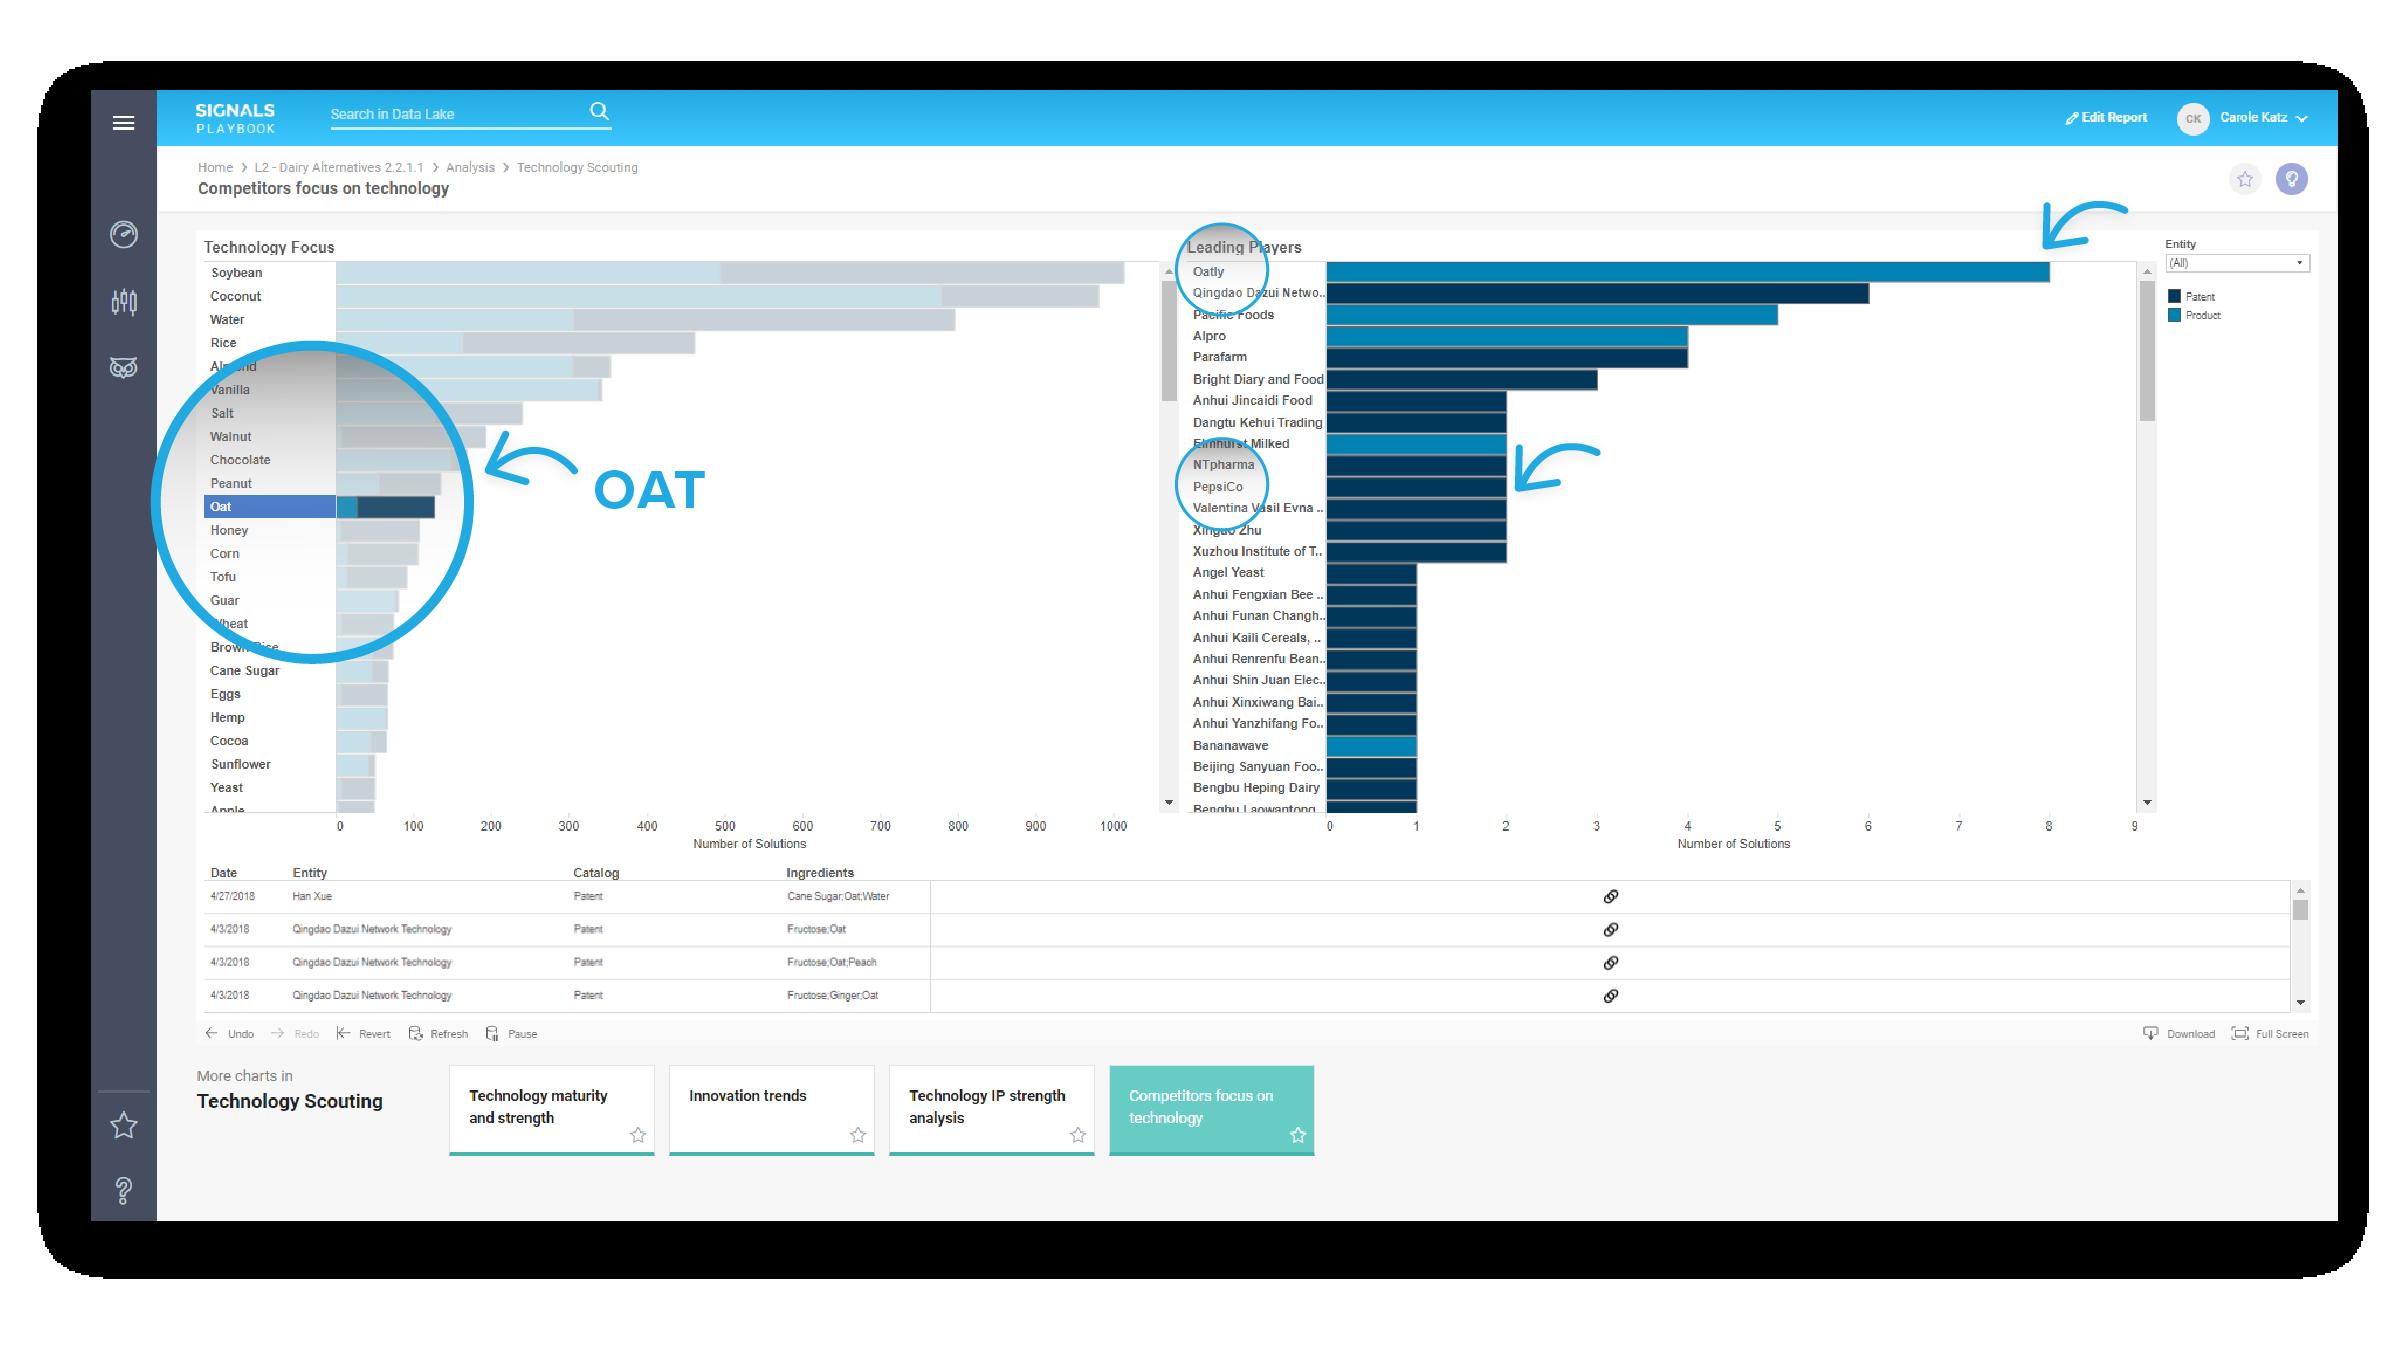 – Signals Playbook™ Insights, Data: Oct 2013 - Sept 2018